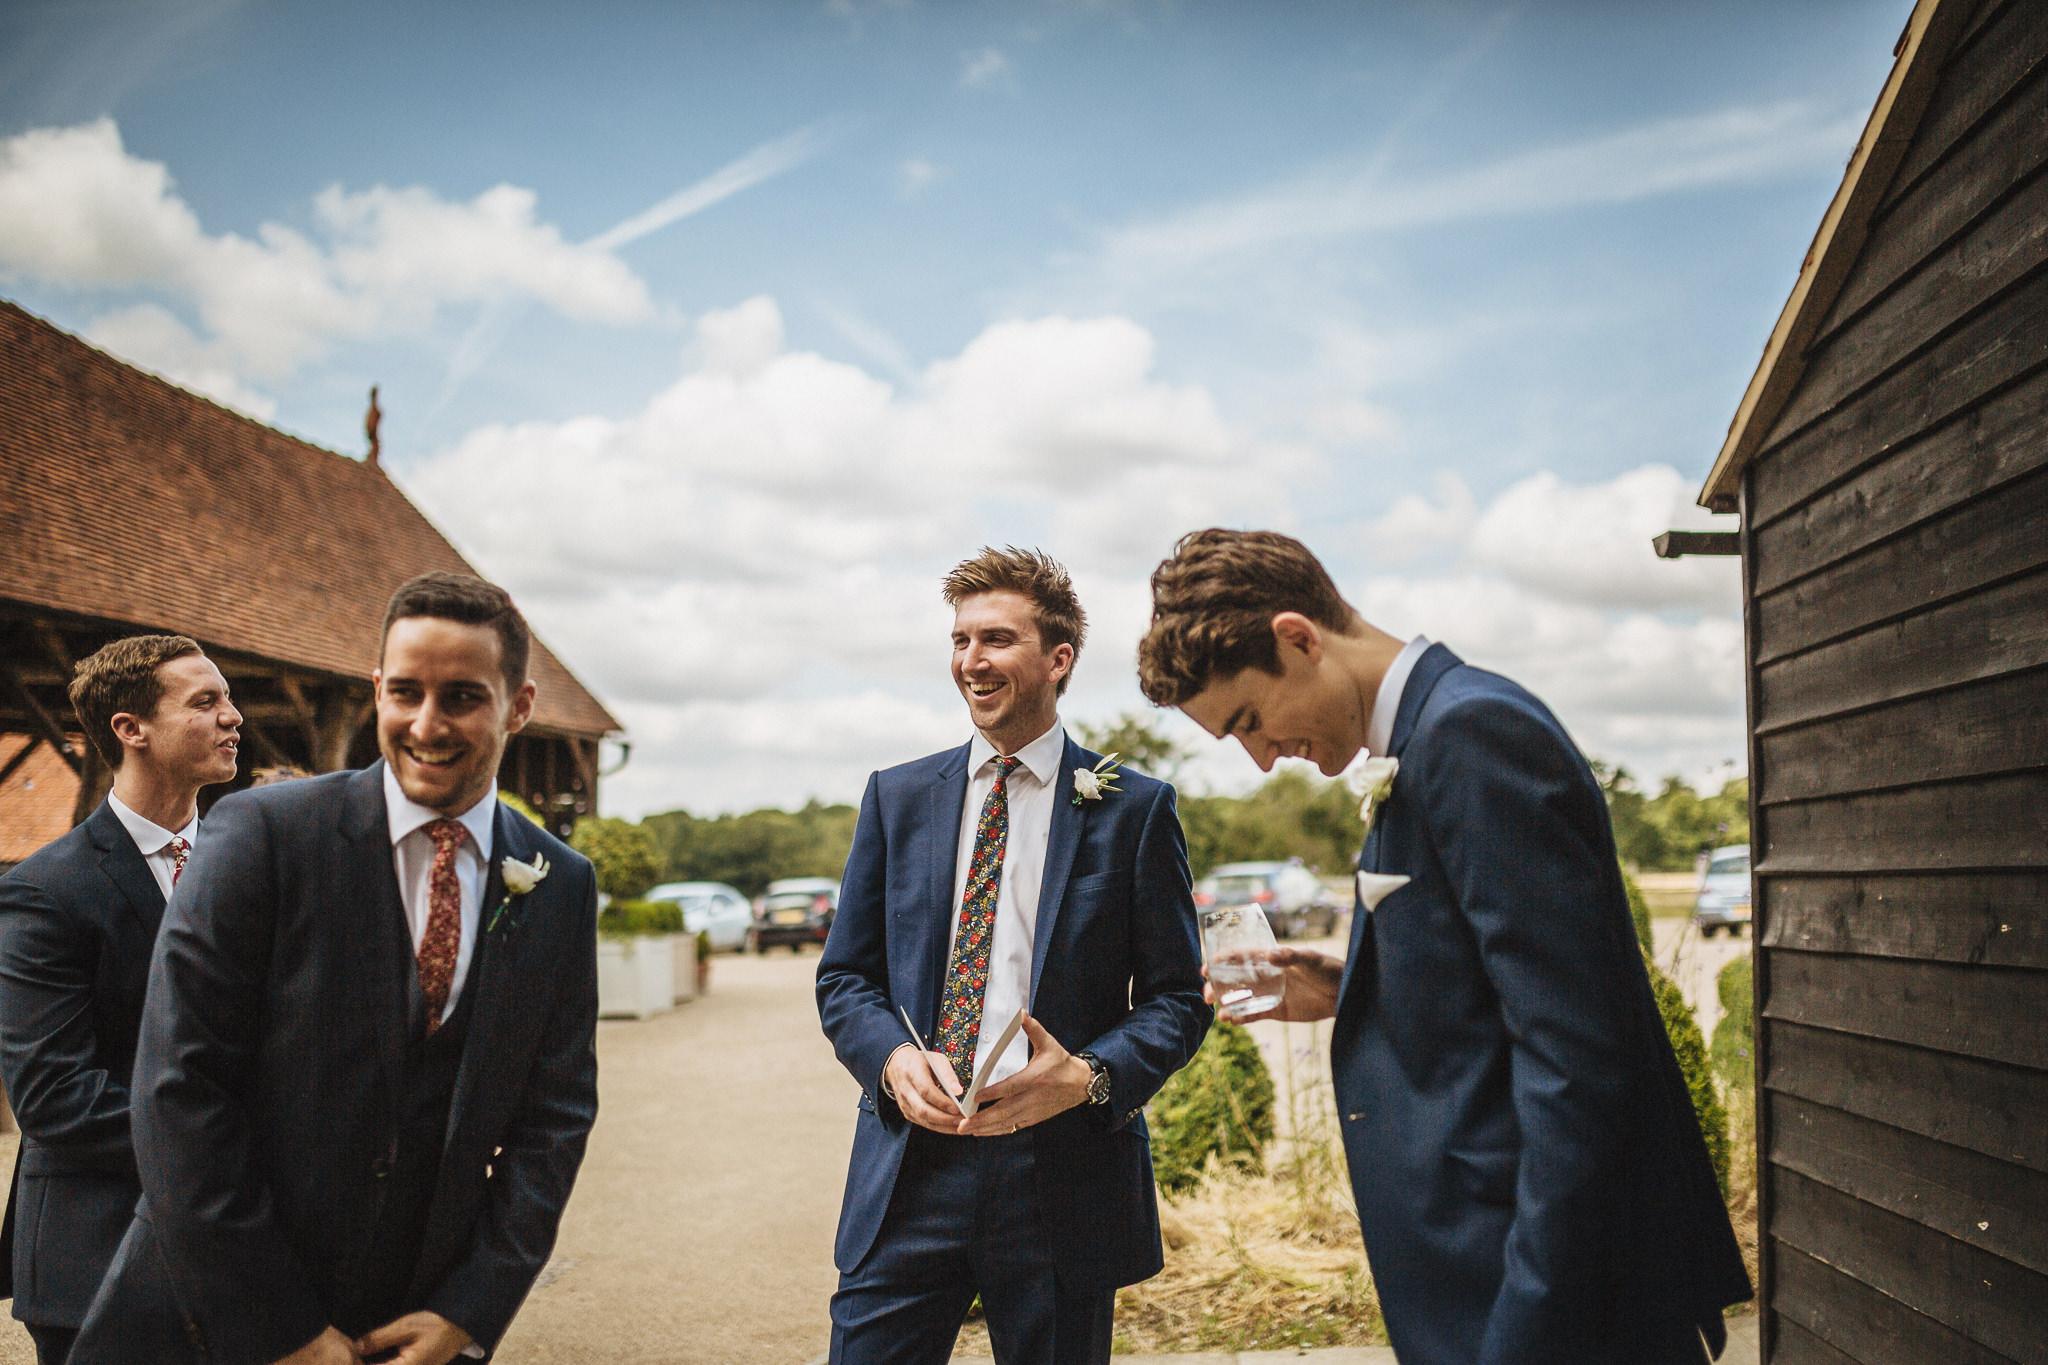 paul-marbrook-Gaynes-Park Wedding-Photographer-90033